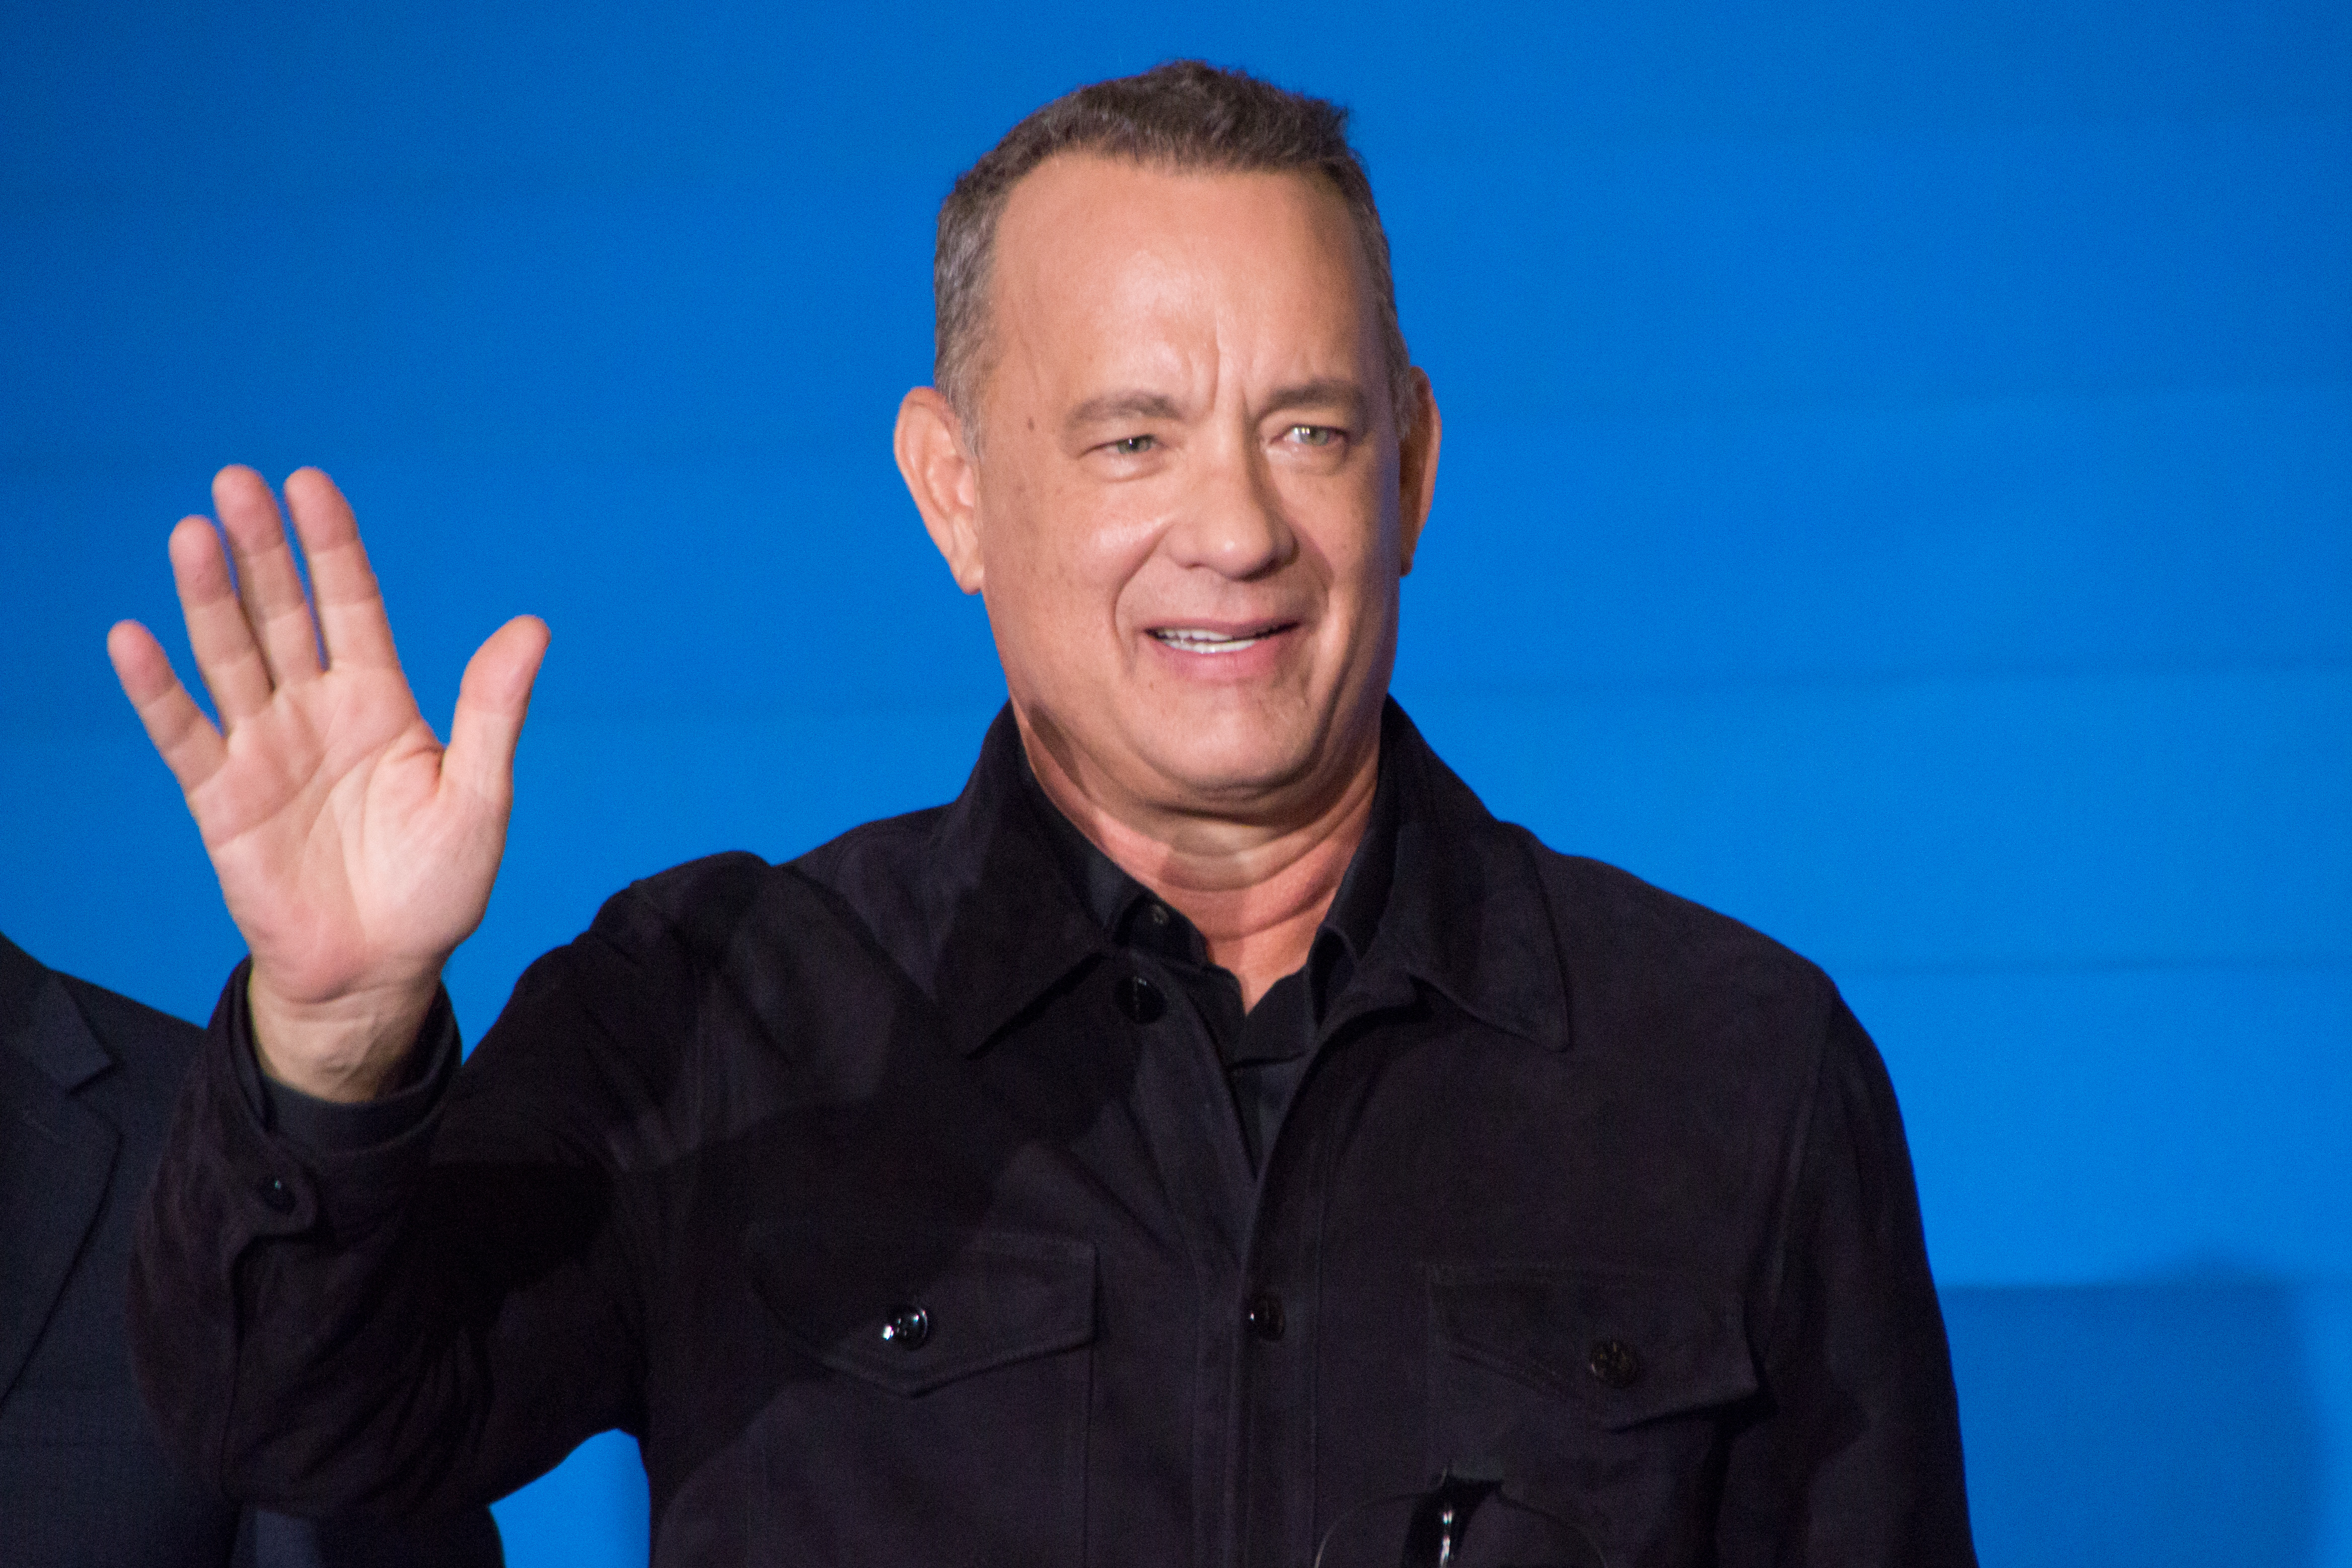 Tom Hanks Facts